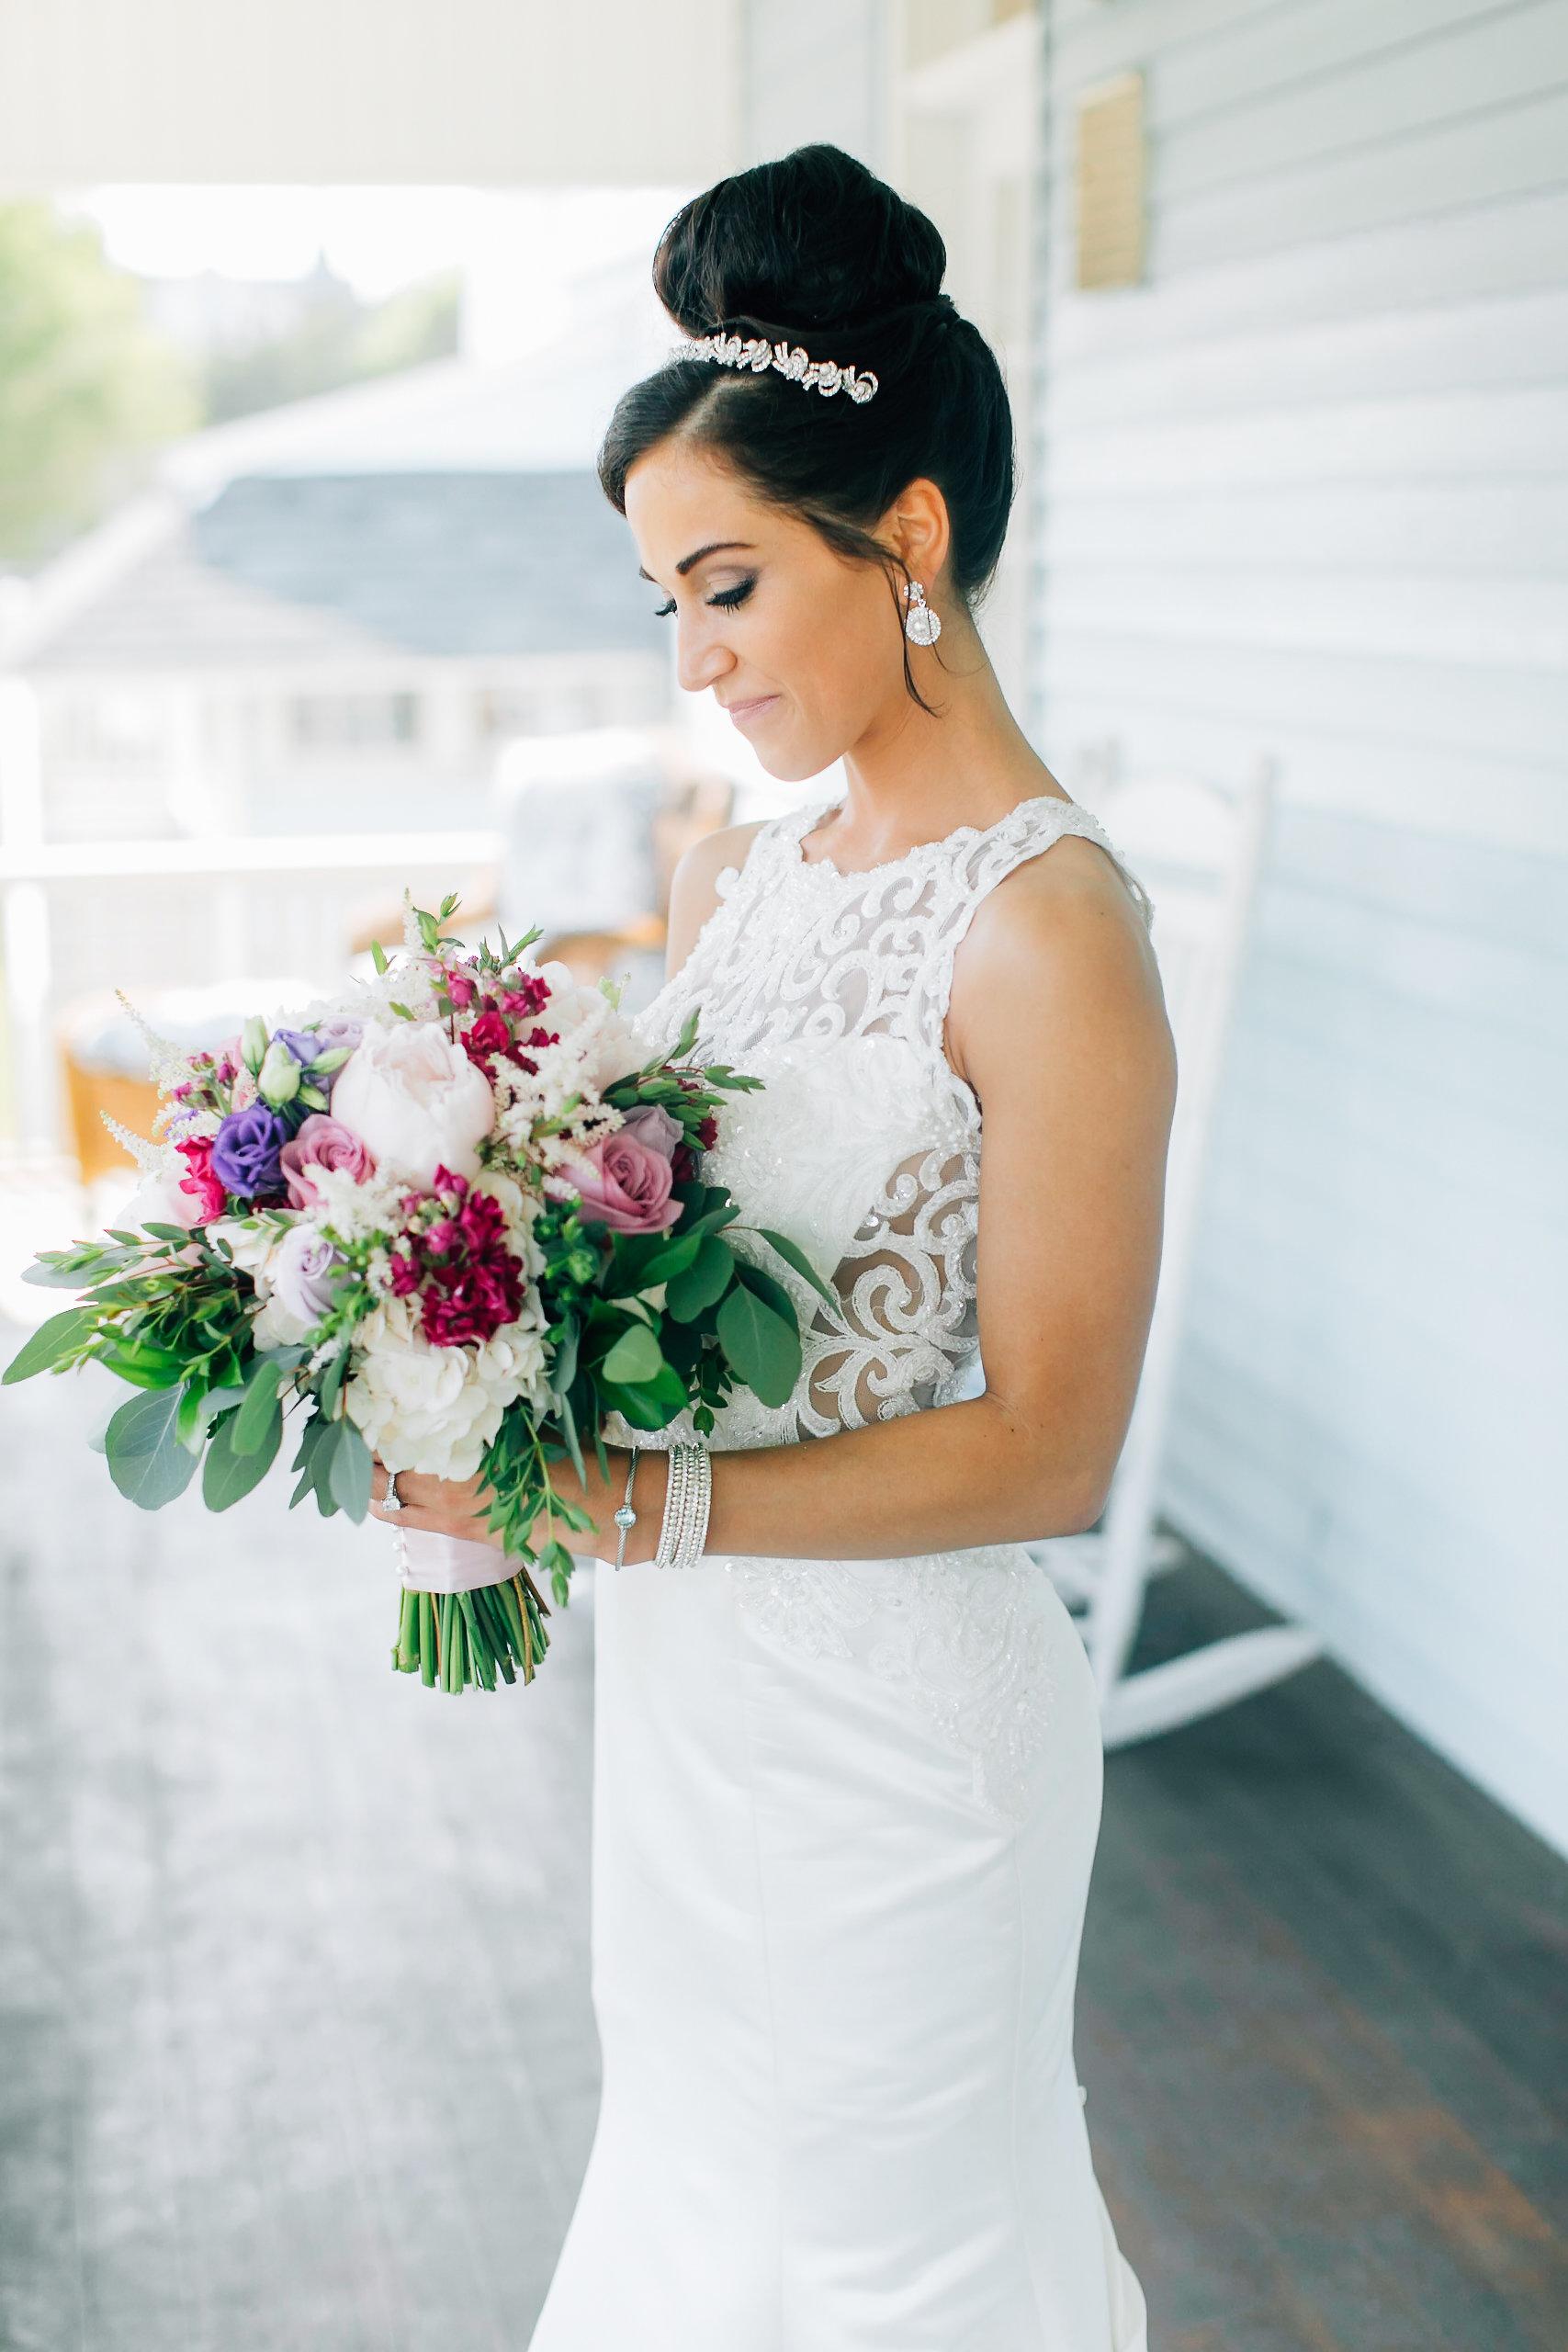 MagdalenaStudios_WeddingPhotographer_WillowCreekWinery_CarissaJoe-220.jpg